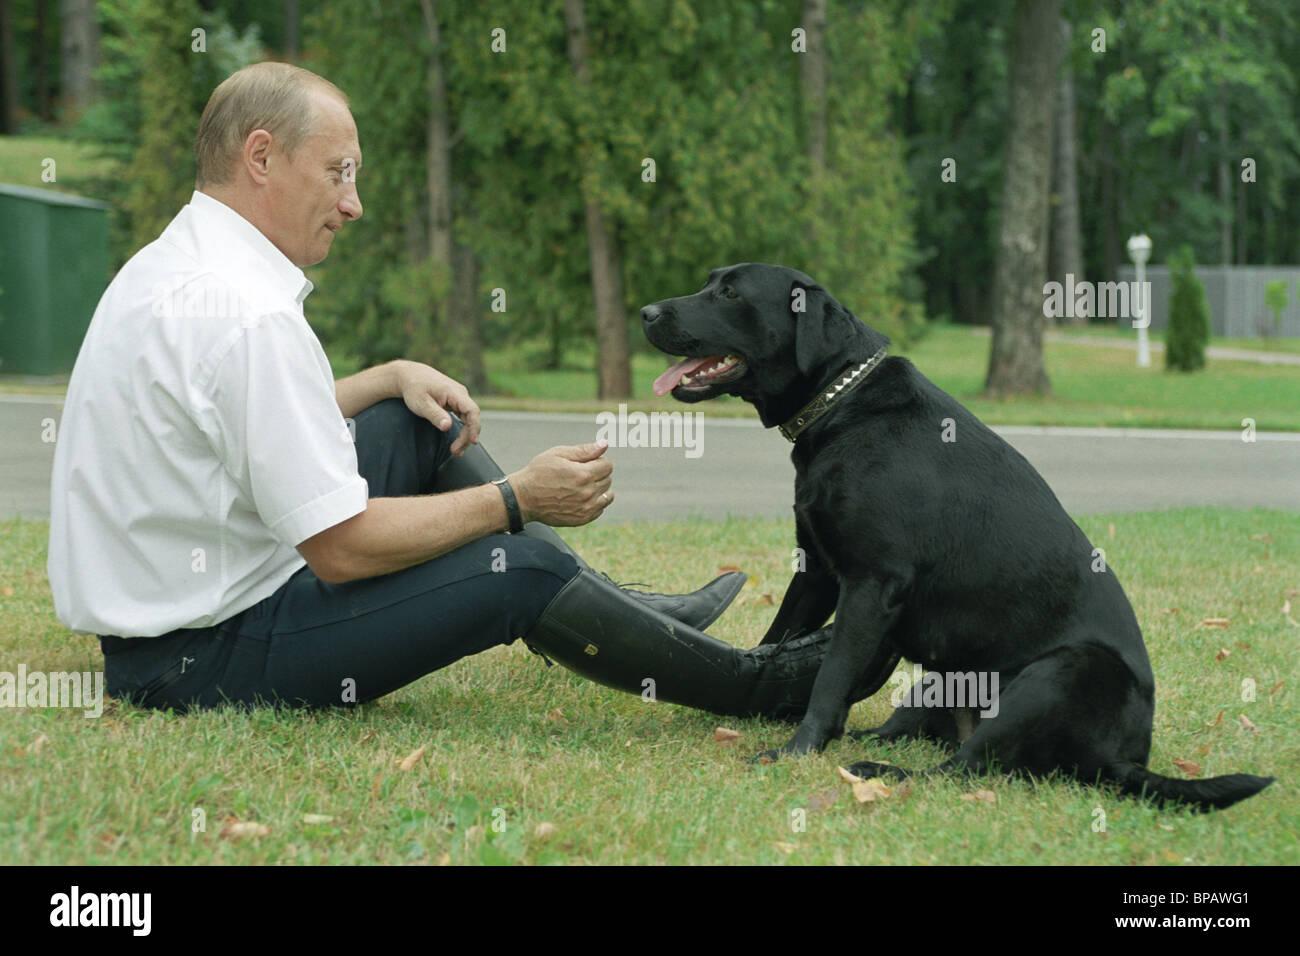 Russian President Vladimir Putin at his residence Novo-Ogaryovo - Stock Image